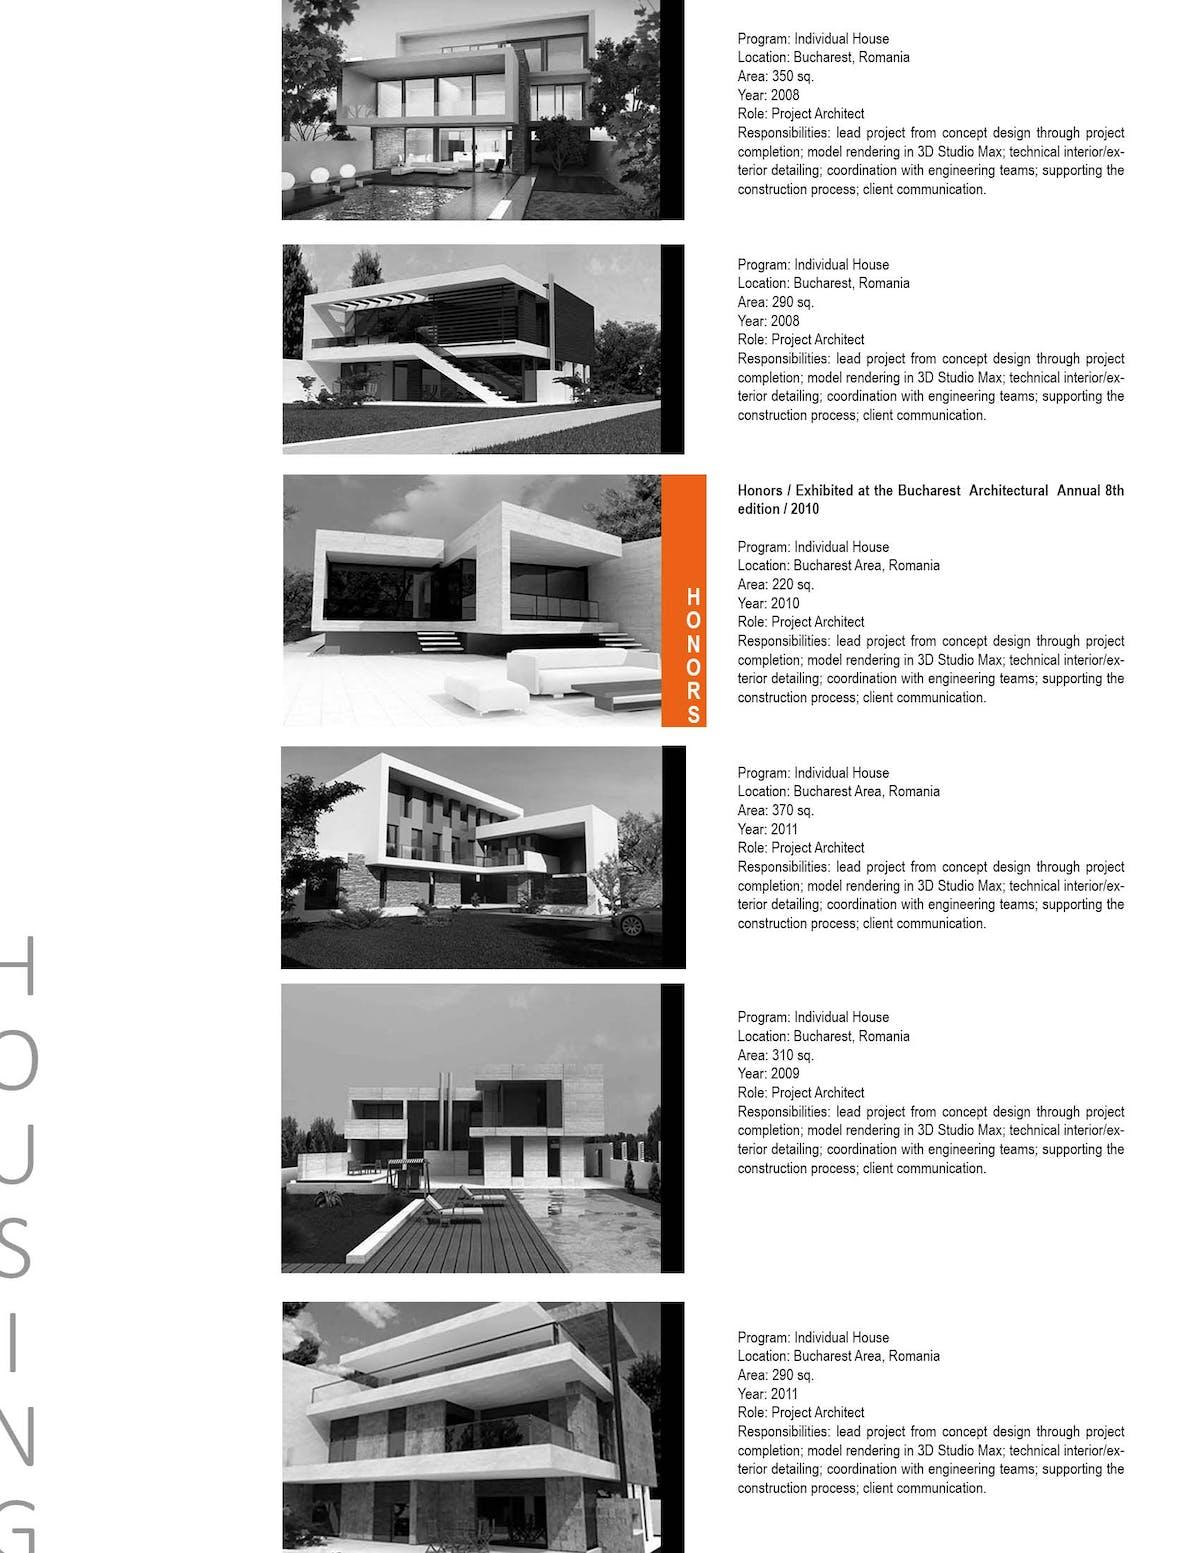 Architect Cristina Oz Archinect